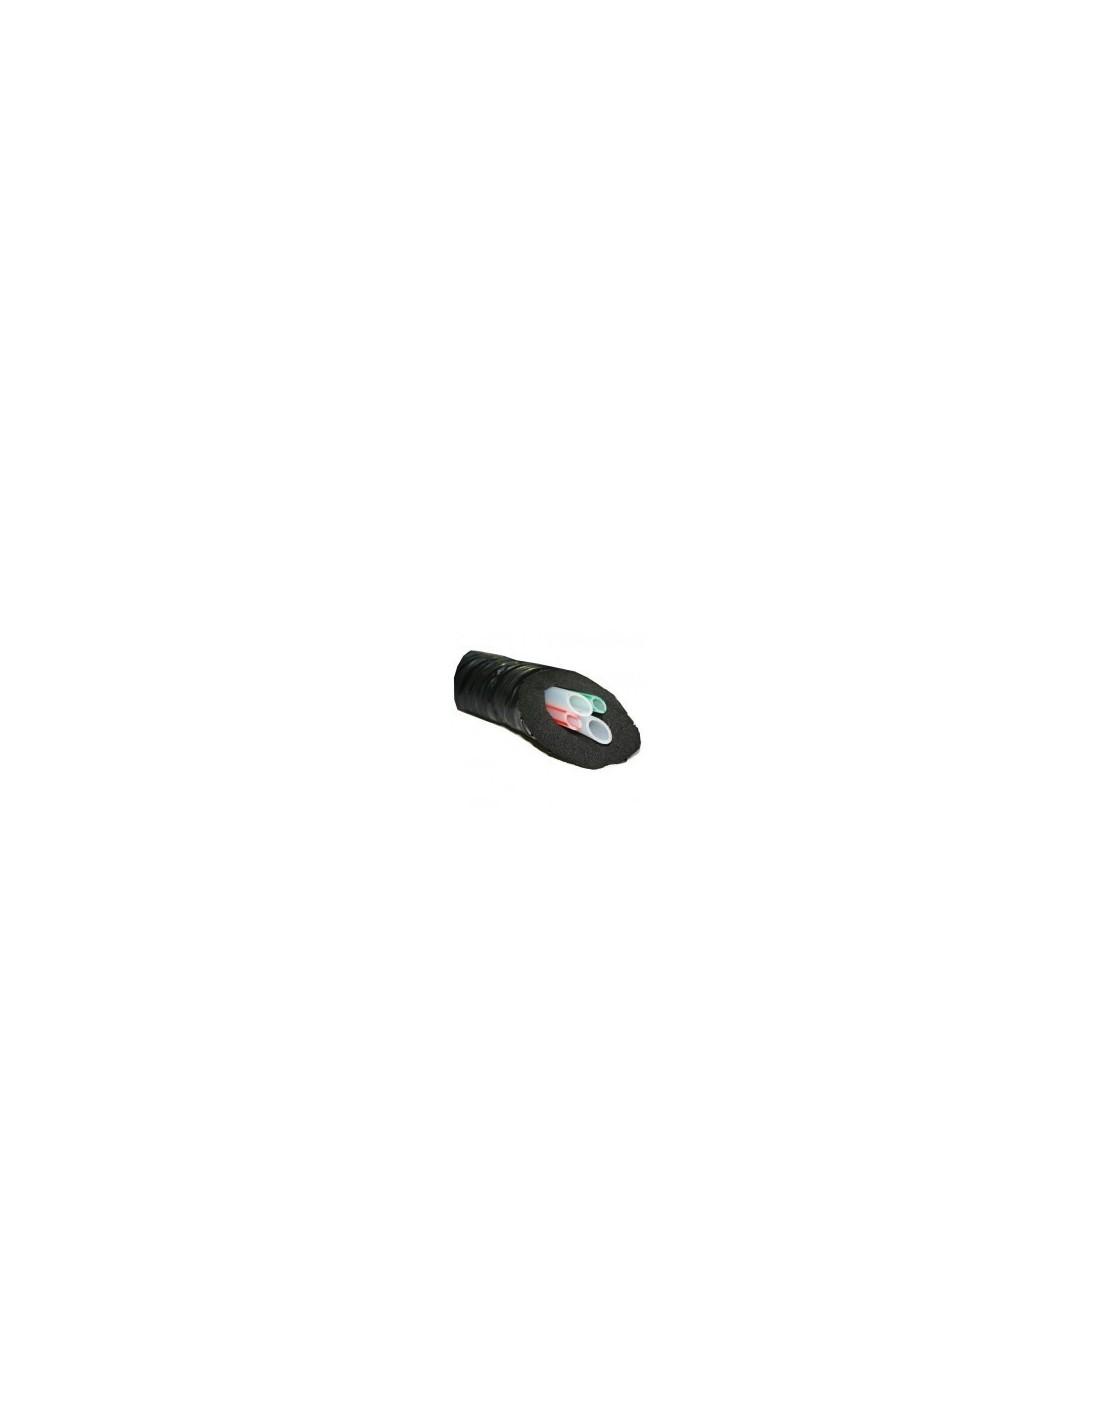 HAD01754 - Slangar och Pyton - Python 2 + 2